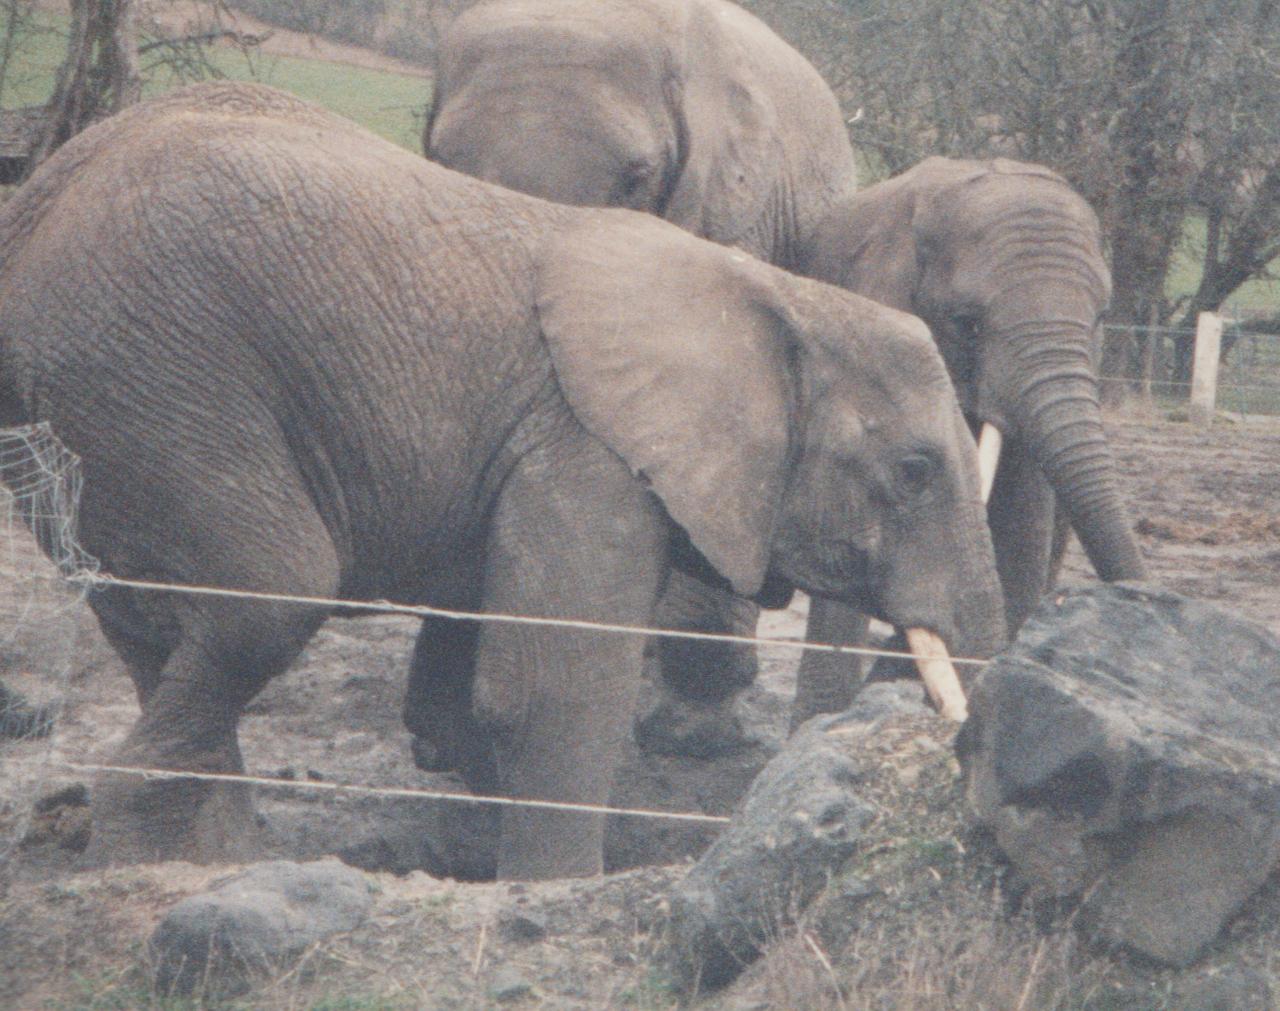 1992-12-26 - Saturday - Wildlife Safari Trip, Marilyn, Crystal-16.png